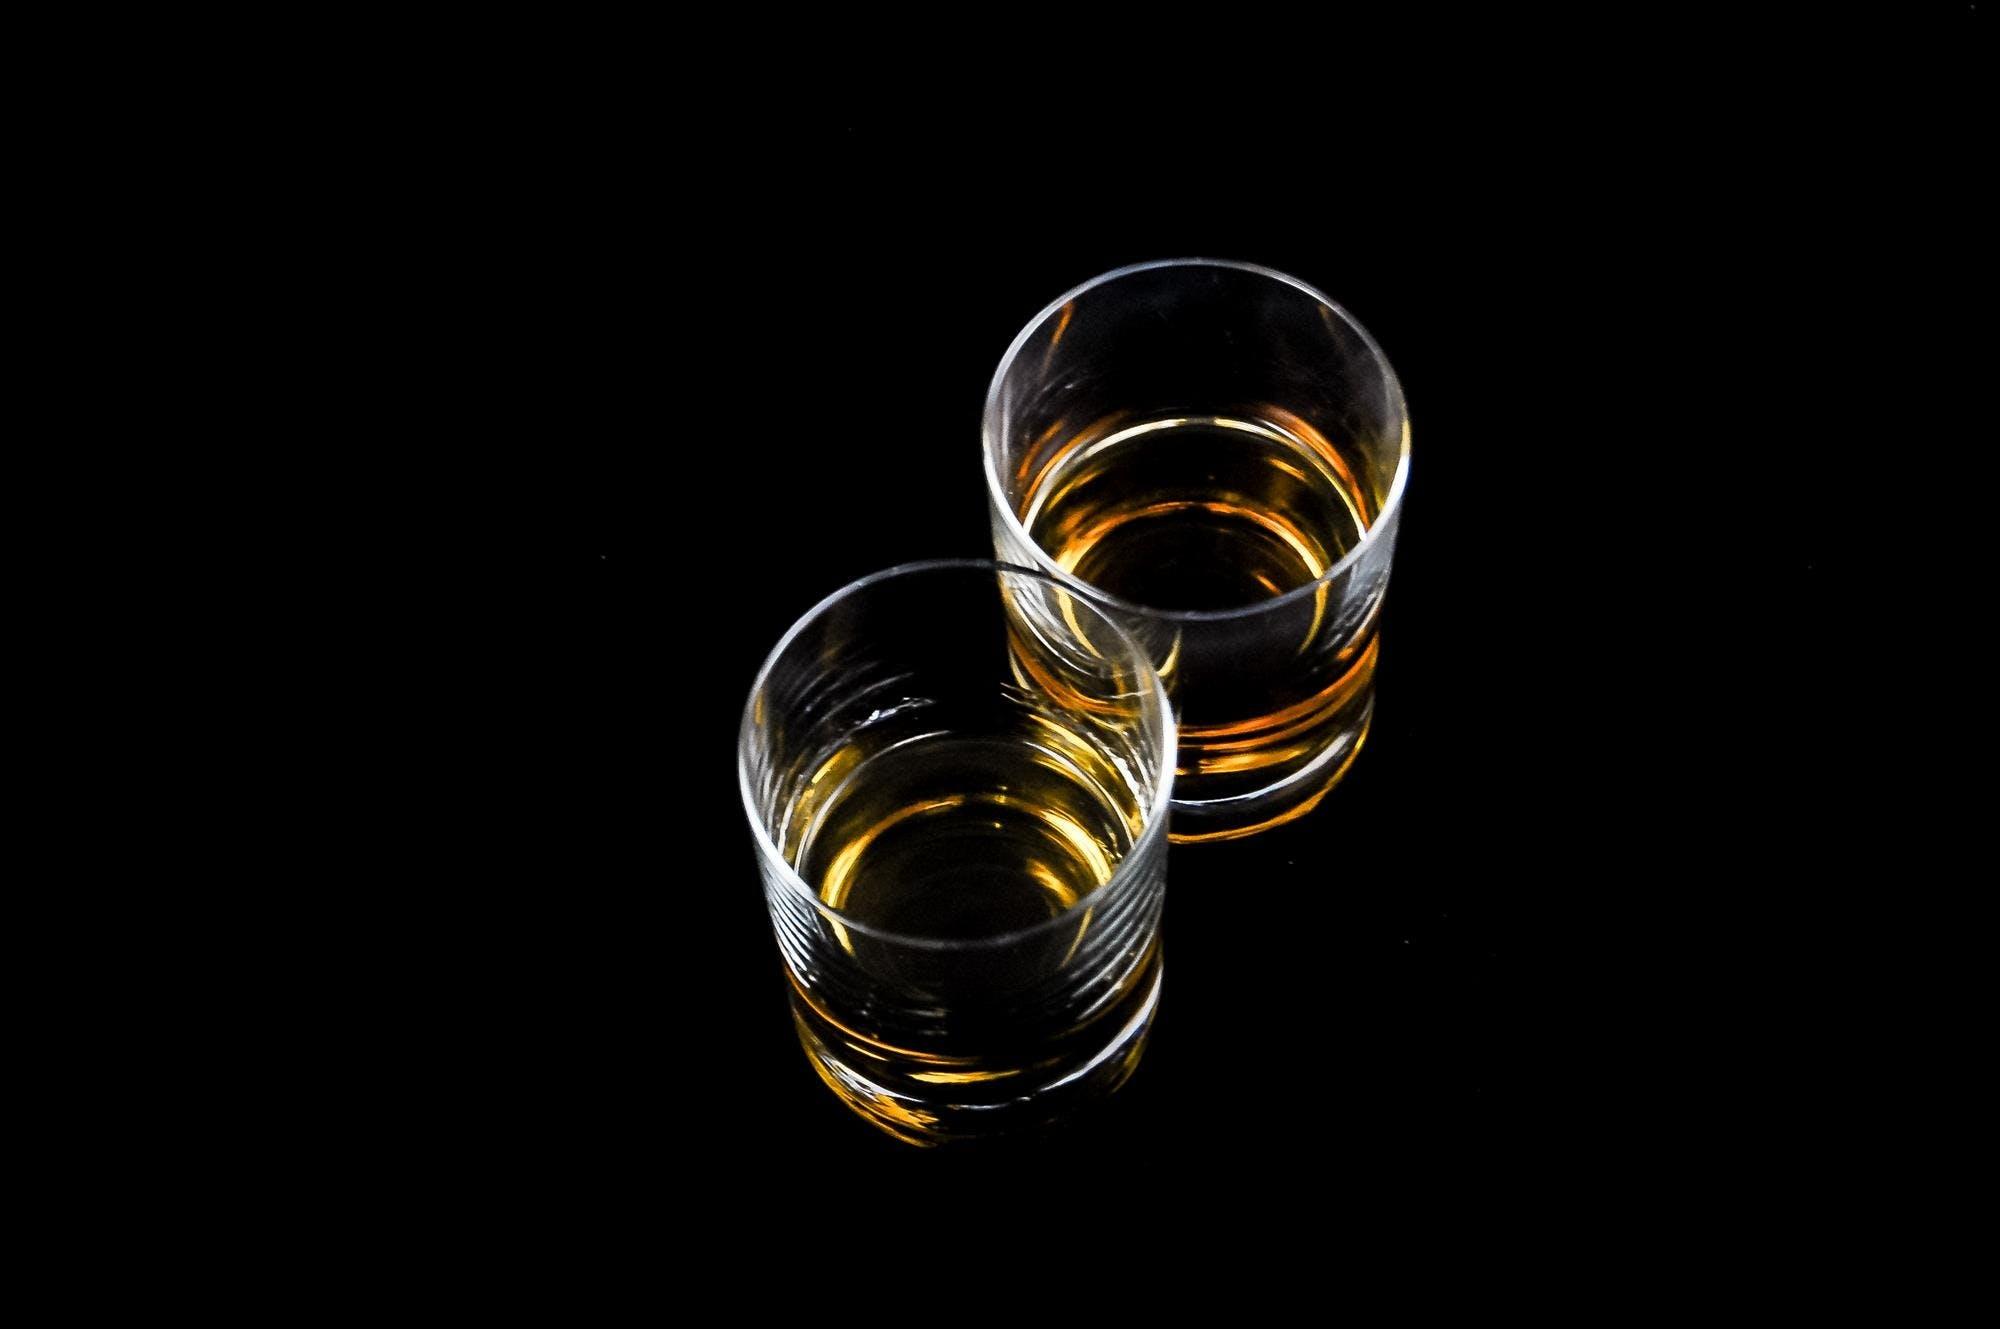 alcoholic beverages, brandy, drink